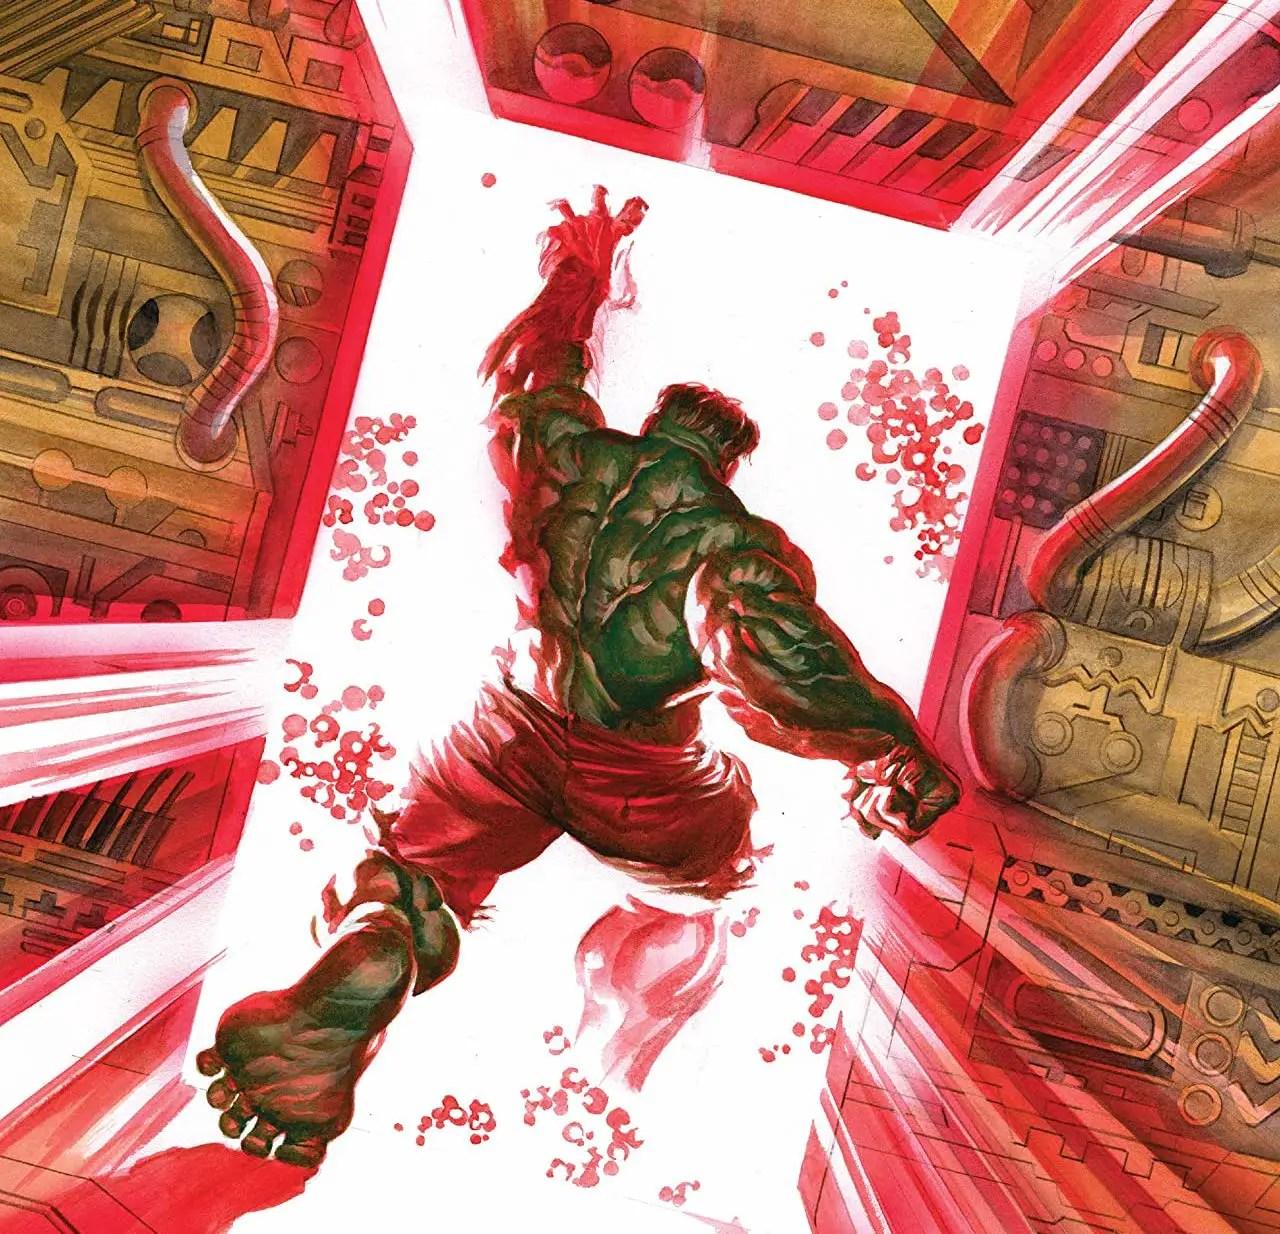 'Immortal Hulk' #49 draws you into the world outside of Hulk